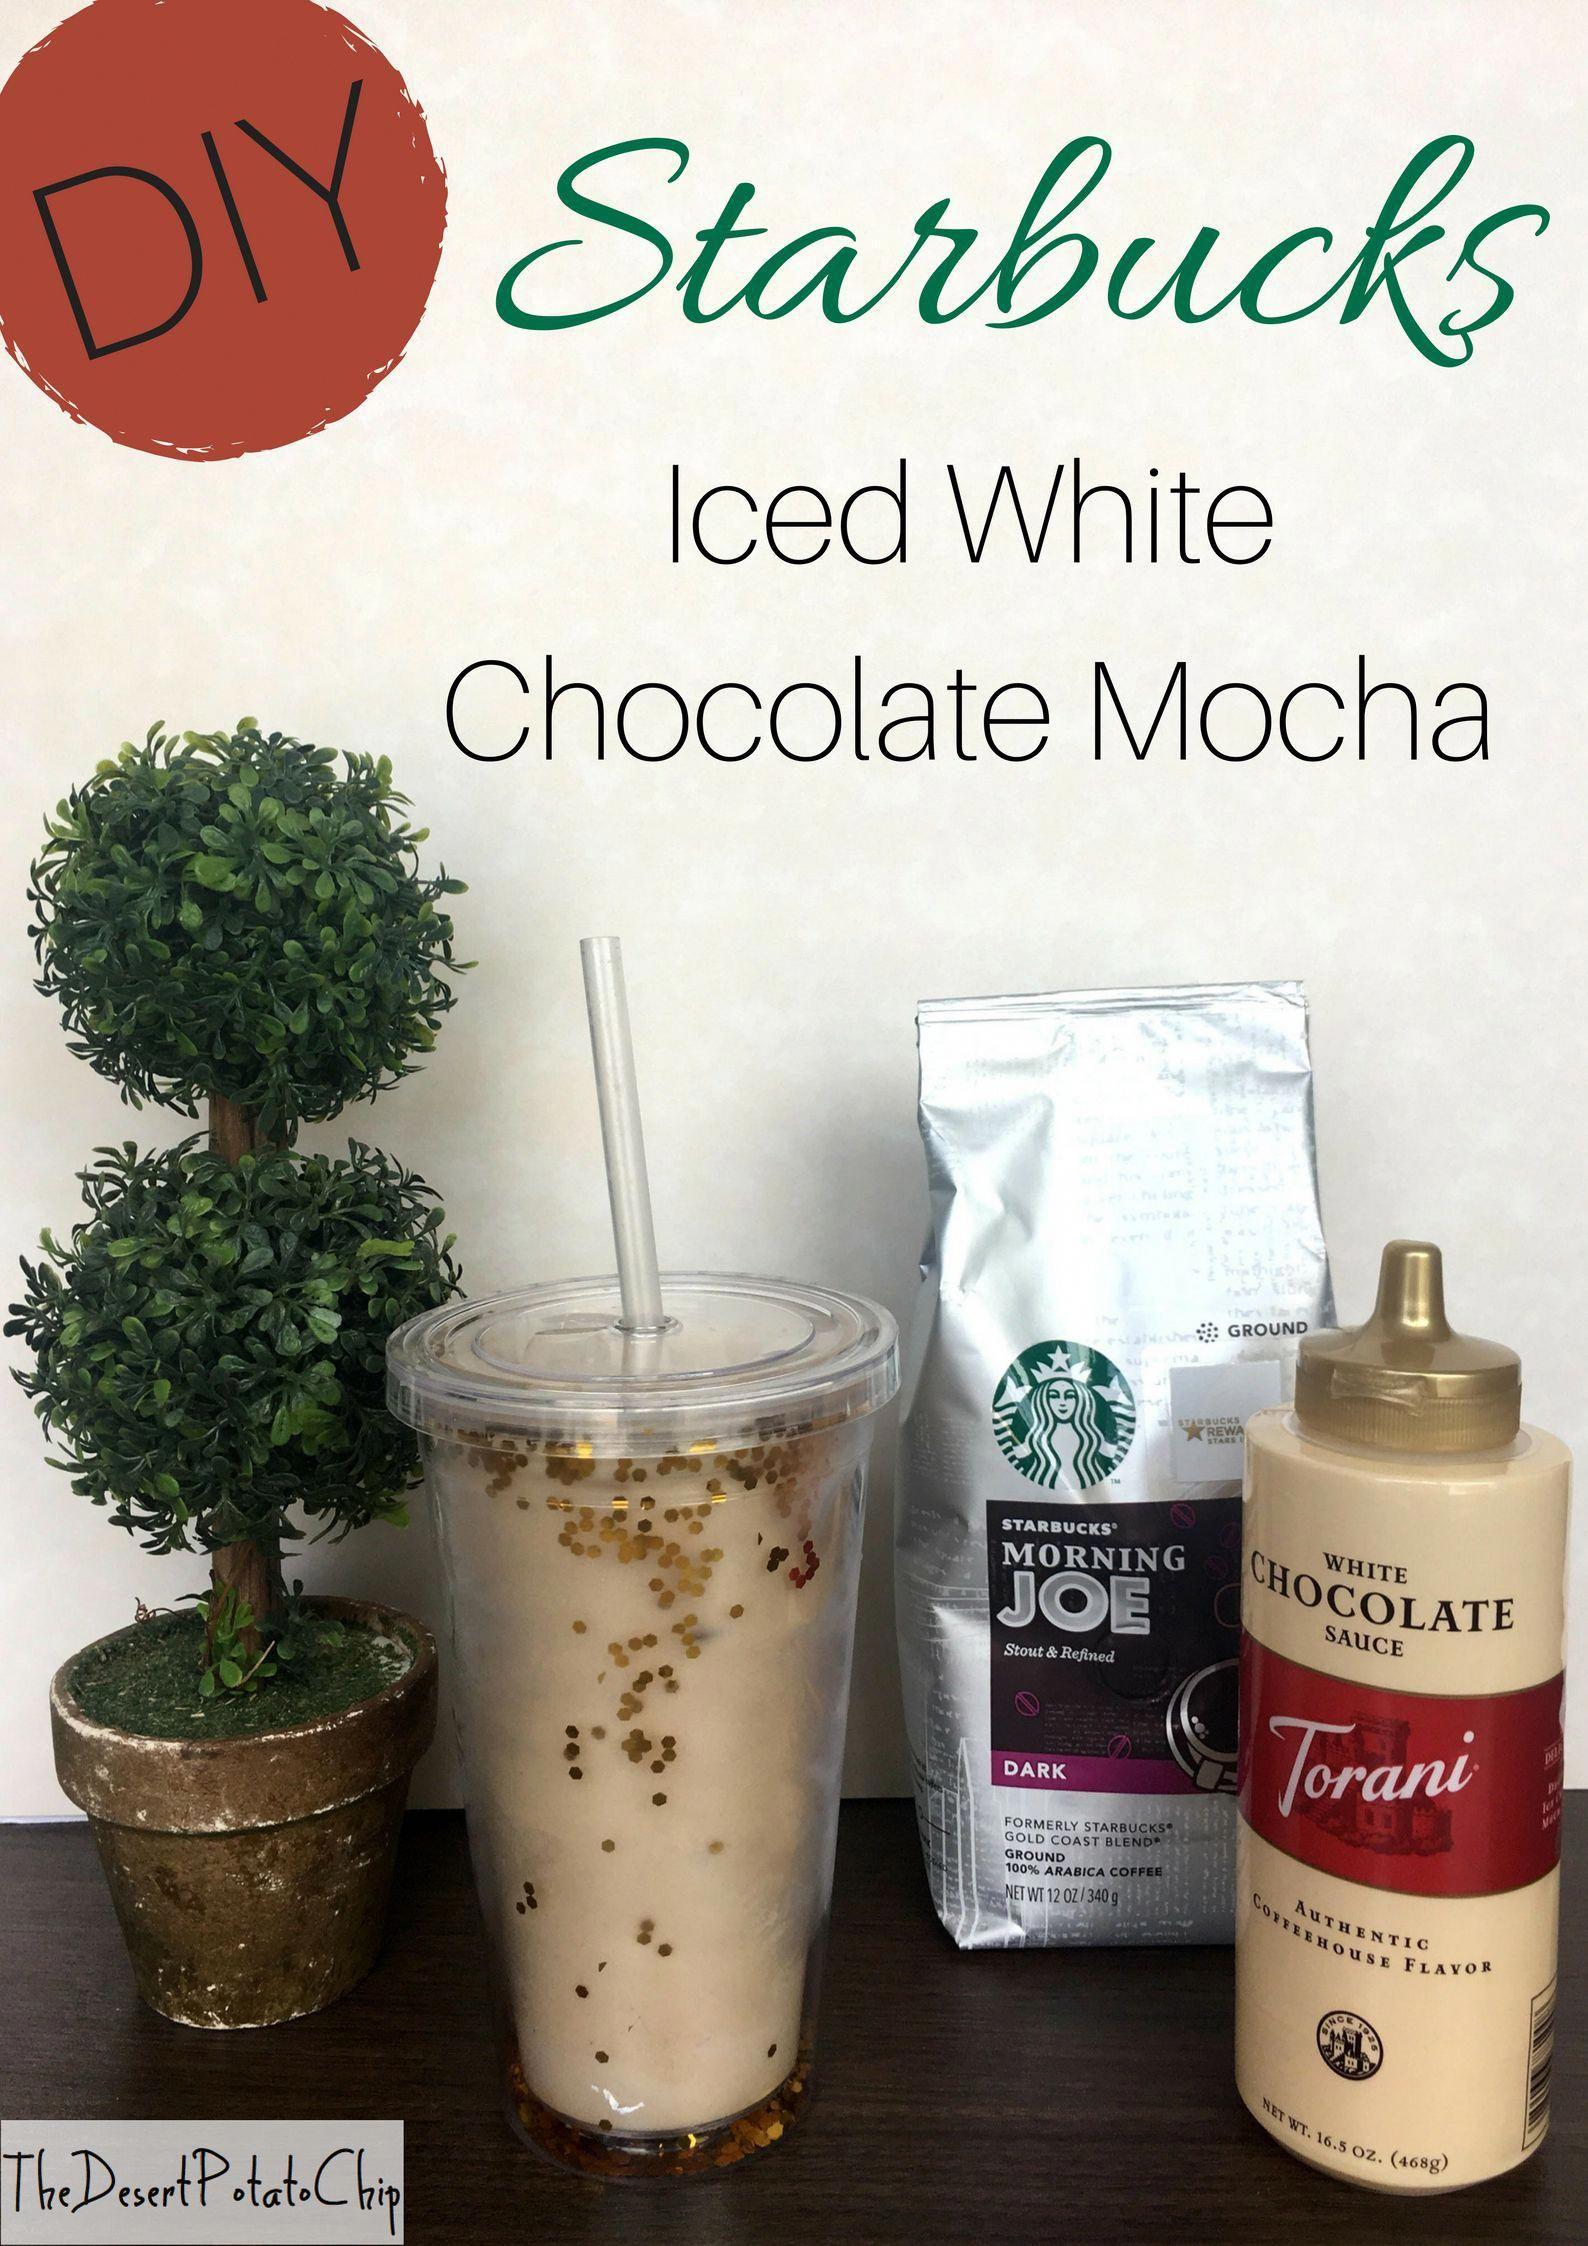 Easy diy starbucks iced white chocolate mocha do you